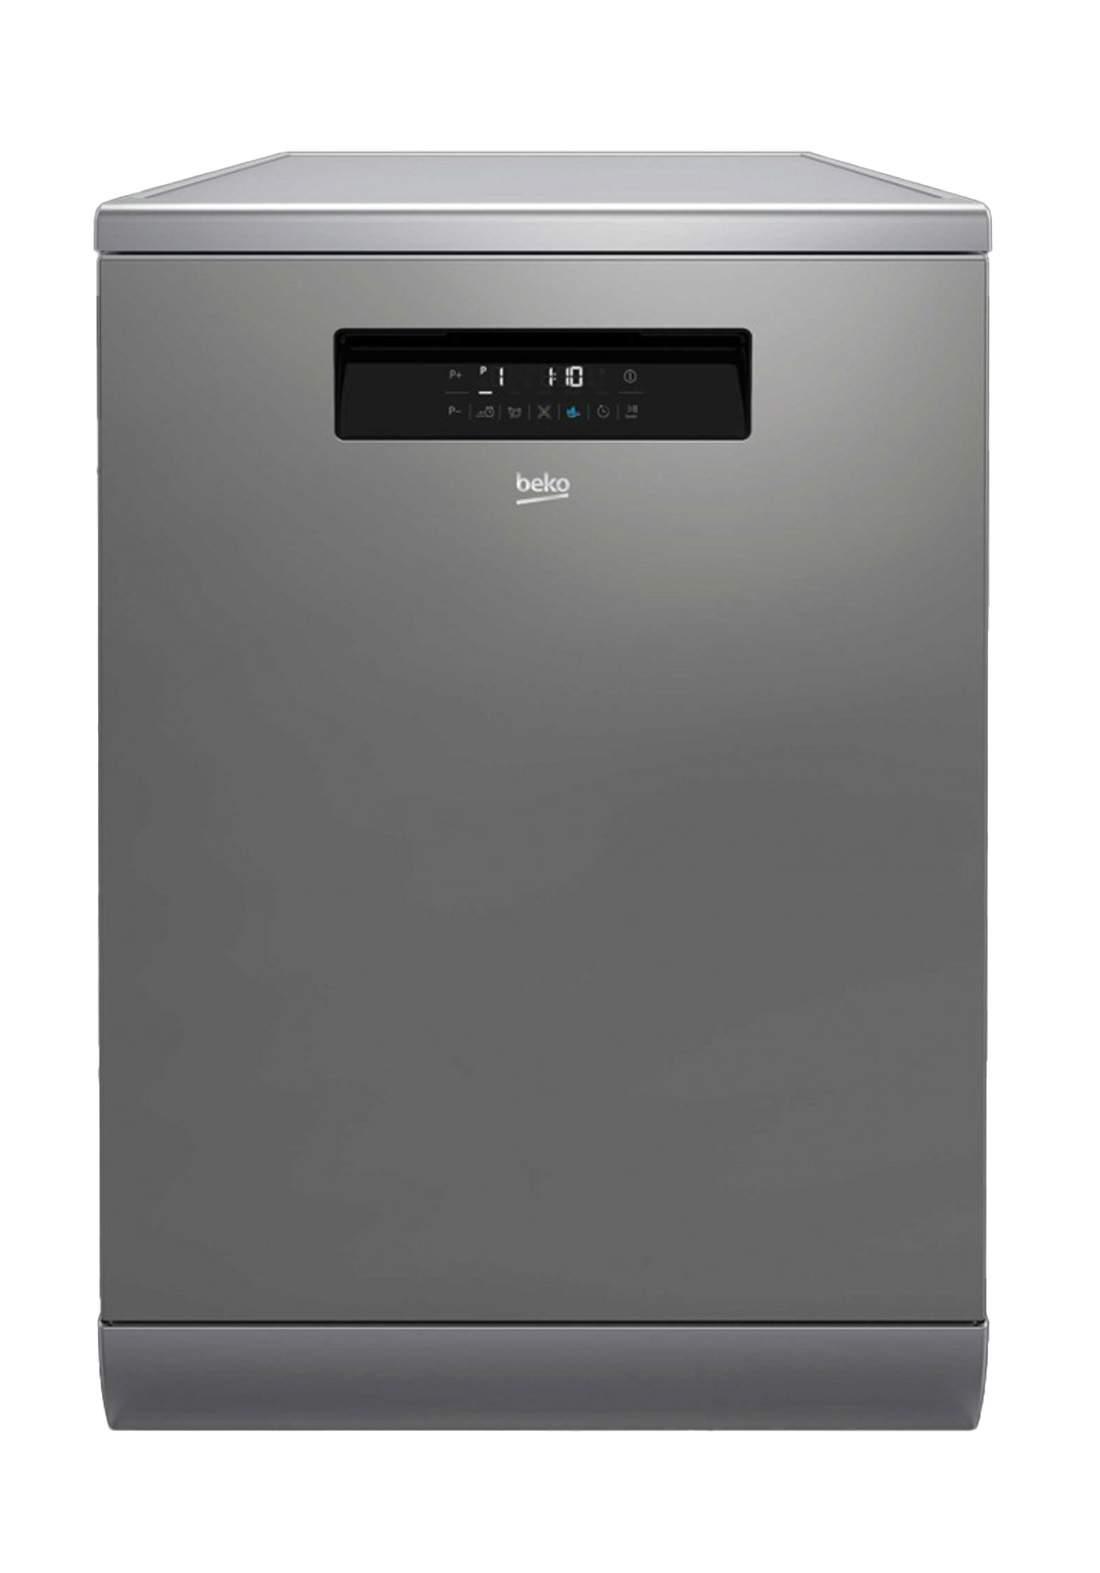 Beko DFN 39531 X Dishwasher 9 Programs Capacity Of 15 Sets - Gray  غسالة صحون